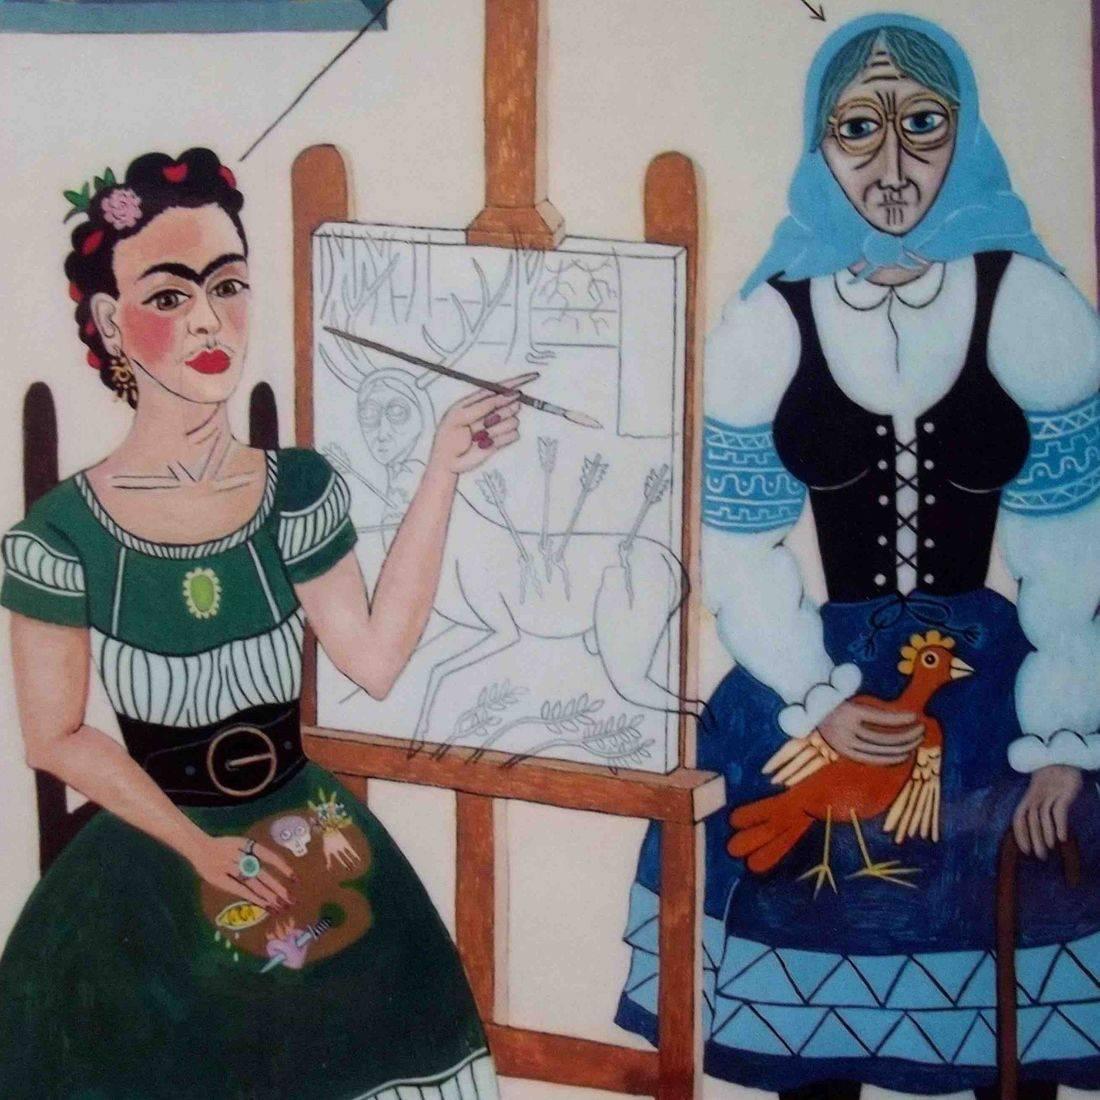 Frida Kahlo, The Little Deer, Grandmother, Chicken, Poland, Casa Azul, Diego Rivera